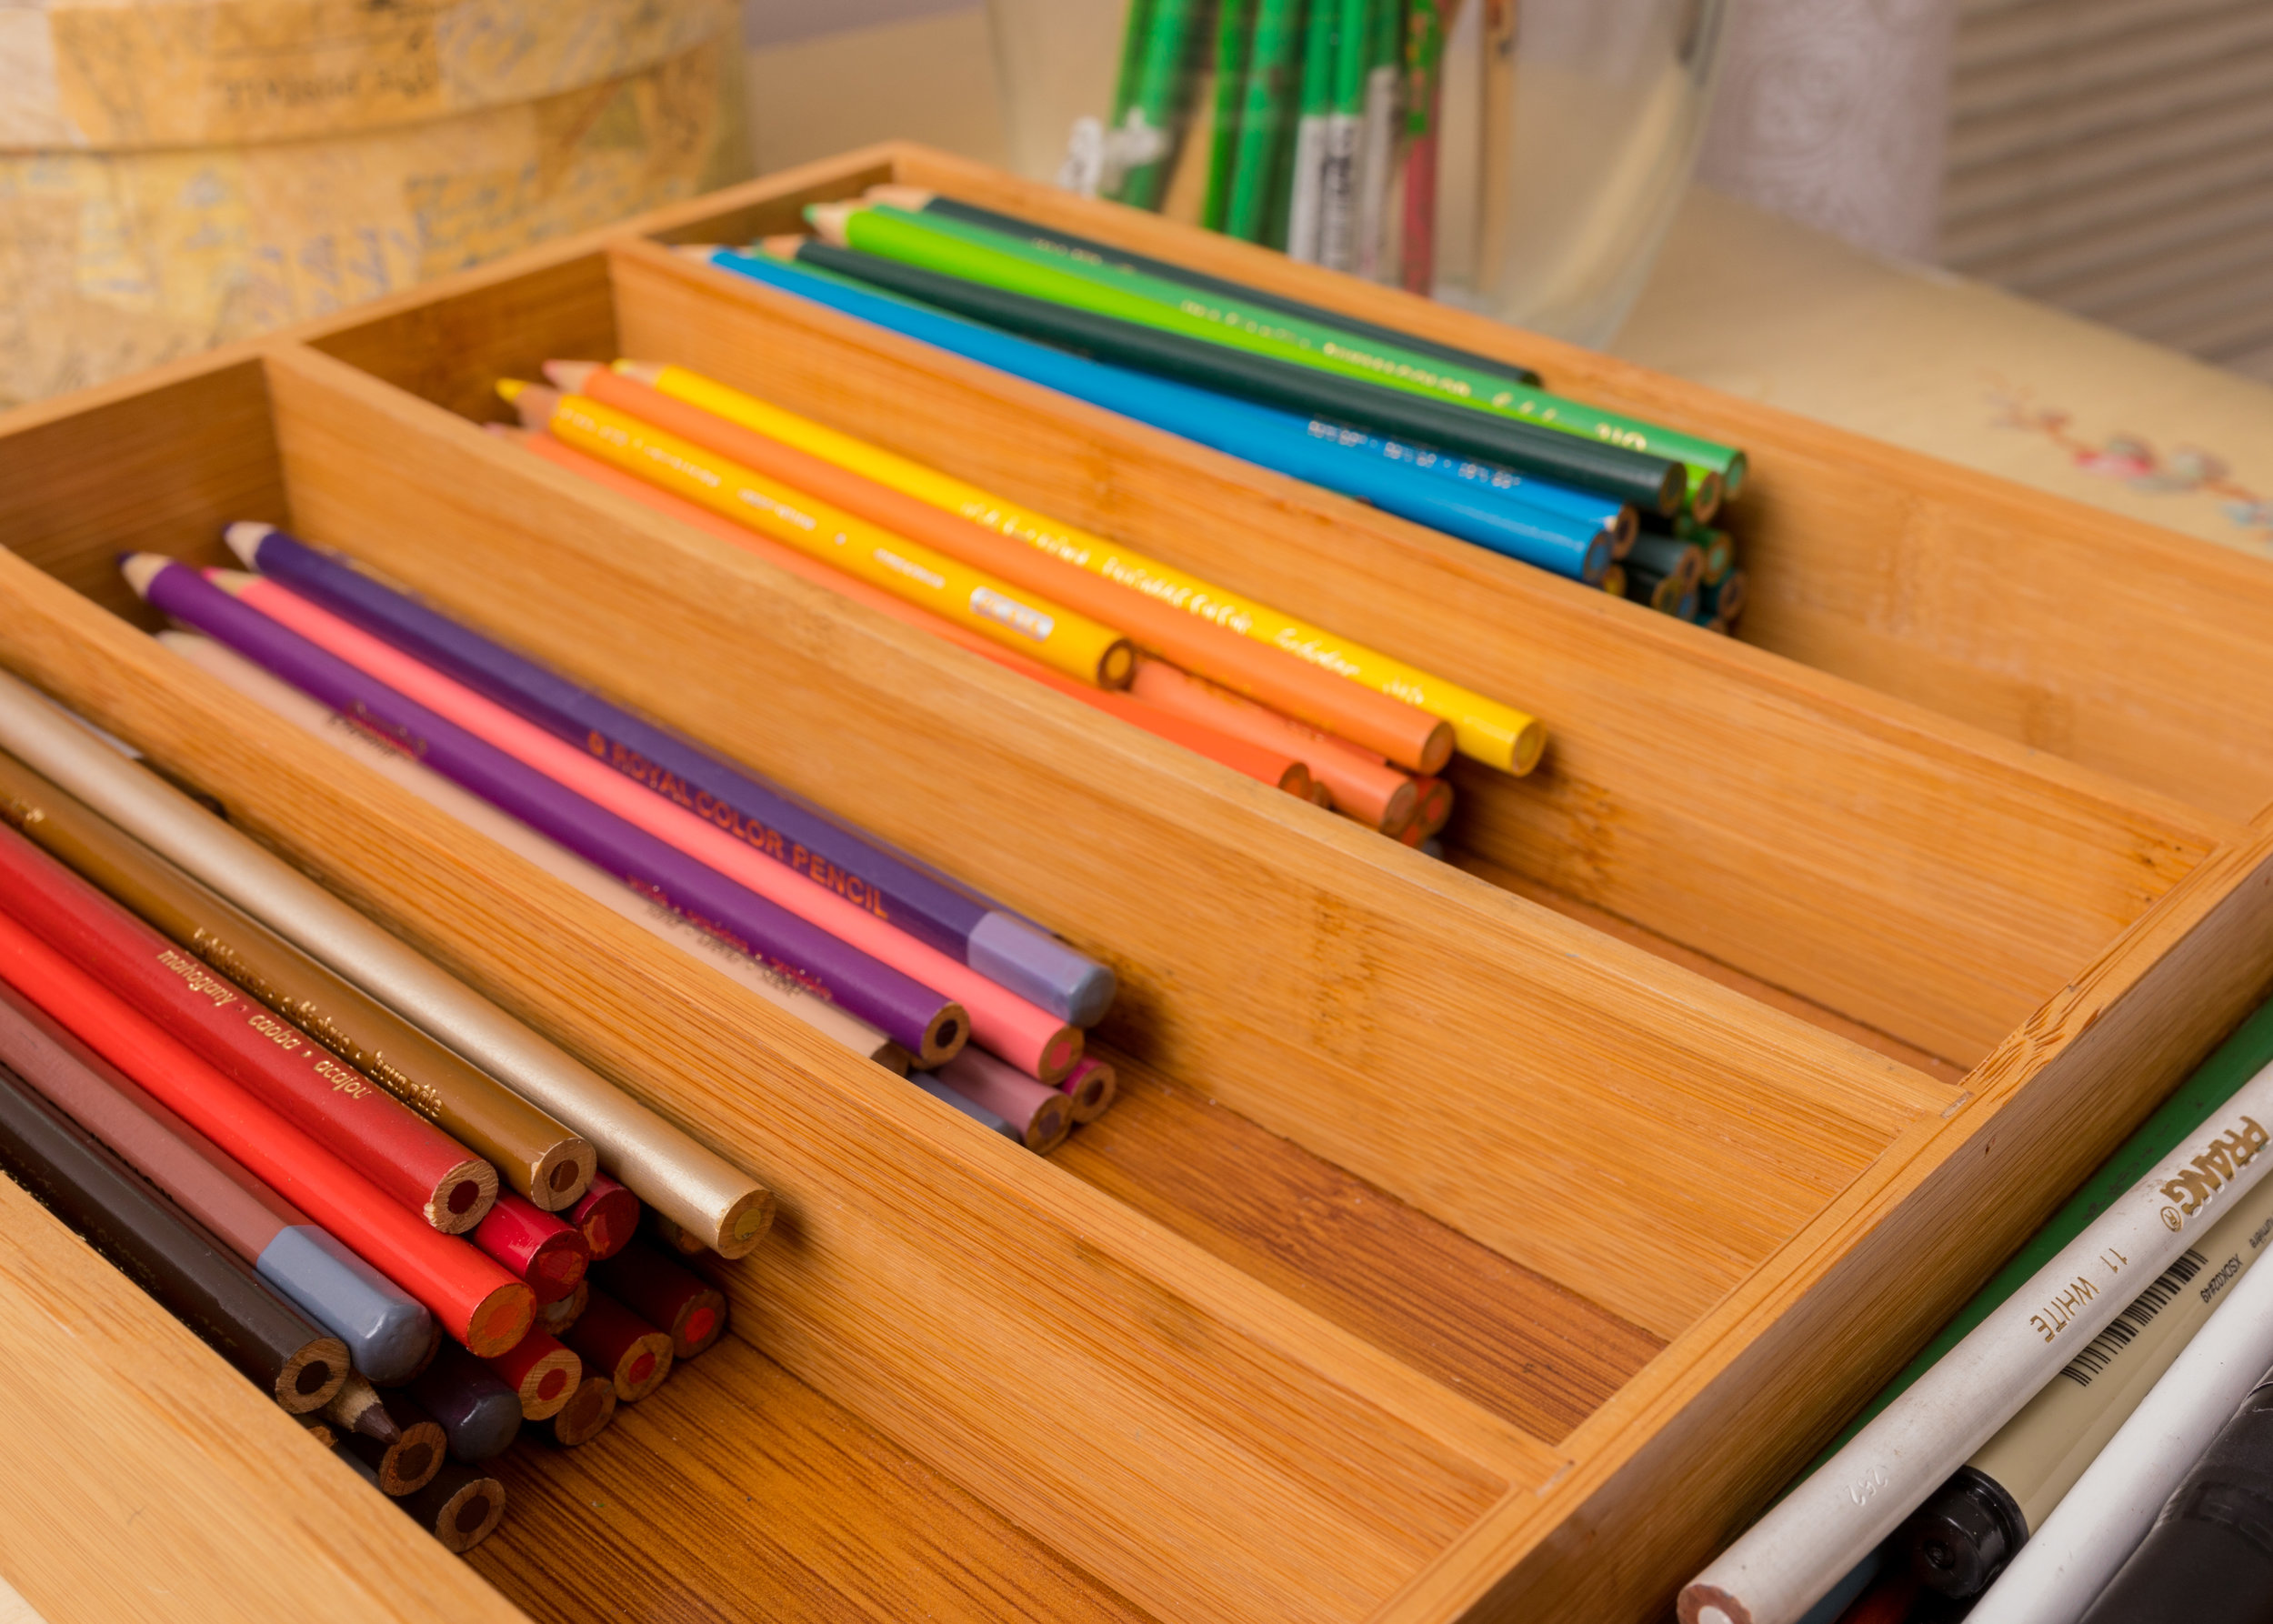 danielle_marx_ellie_design_colored_pencils.JPG